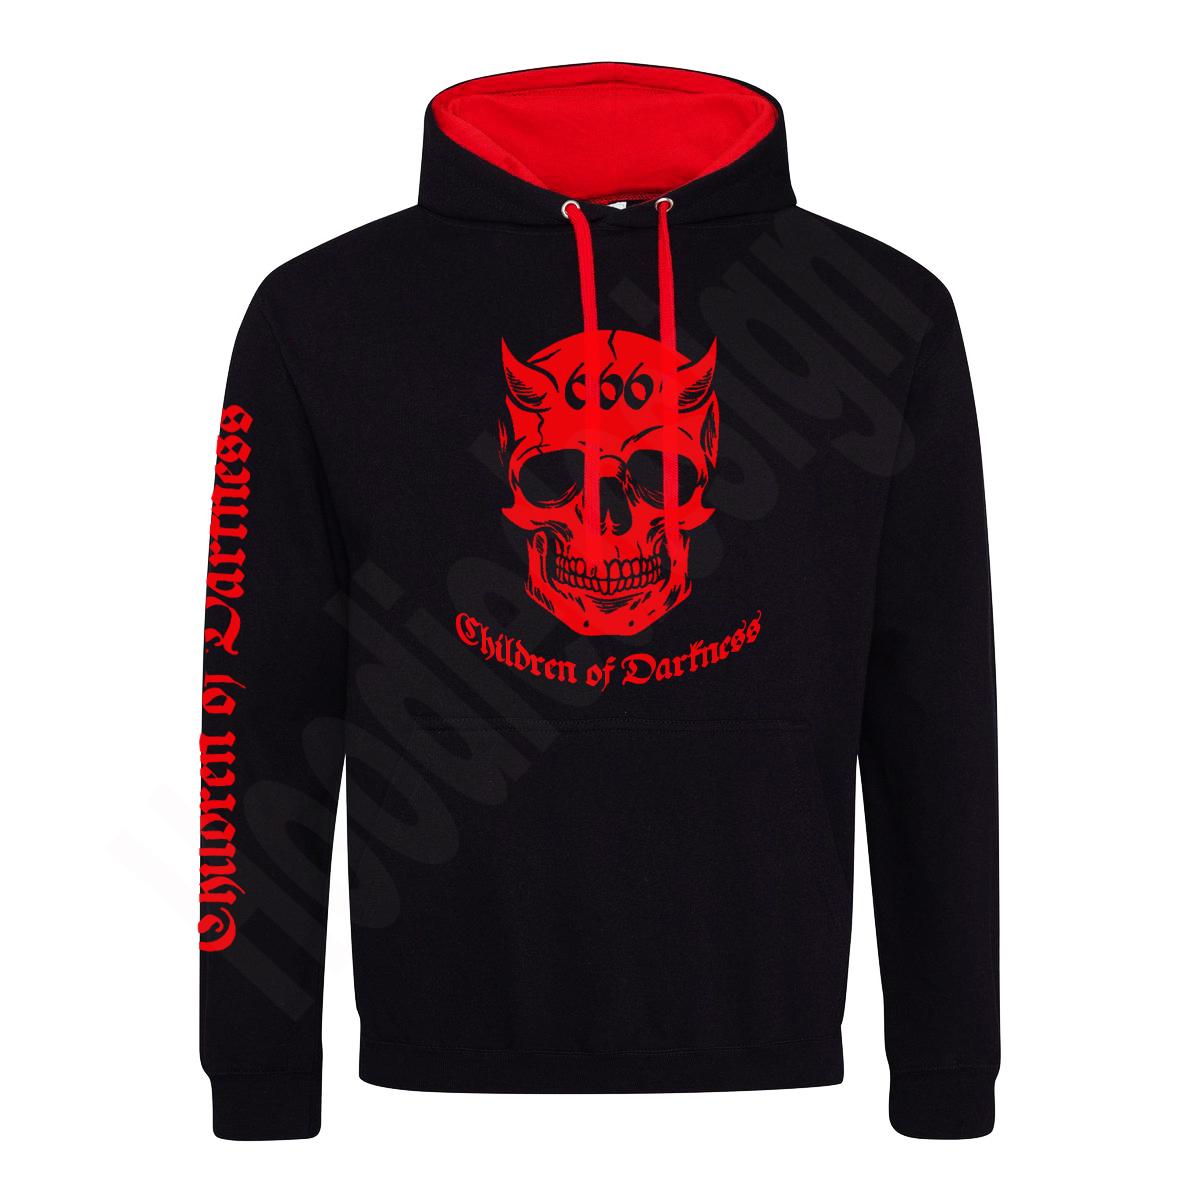 Kontrast Hoodie schwarz rot mit Gothic Motiv